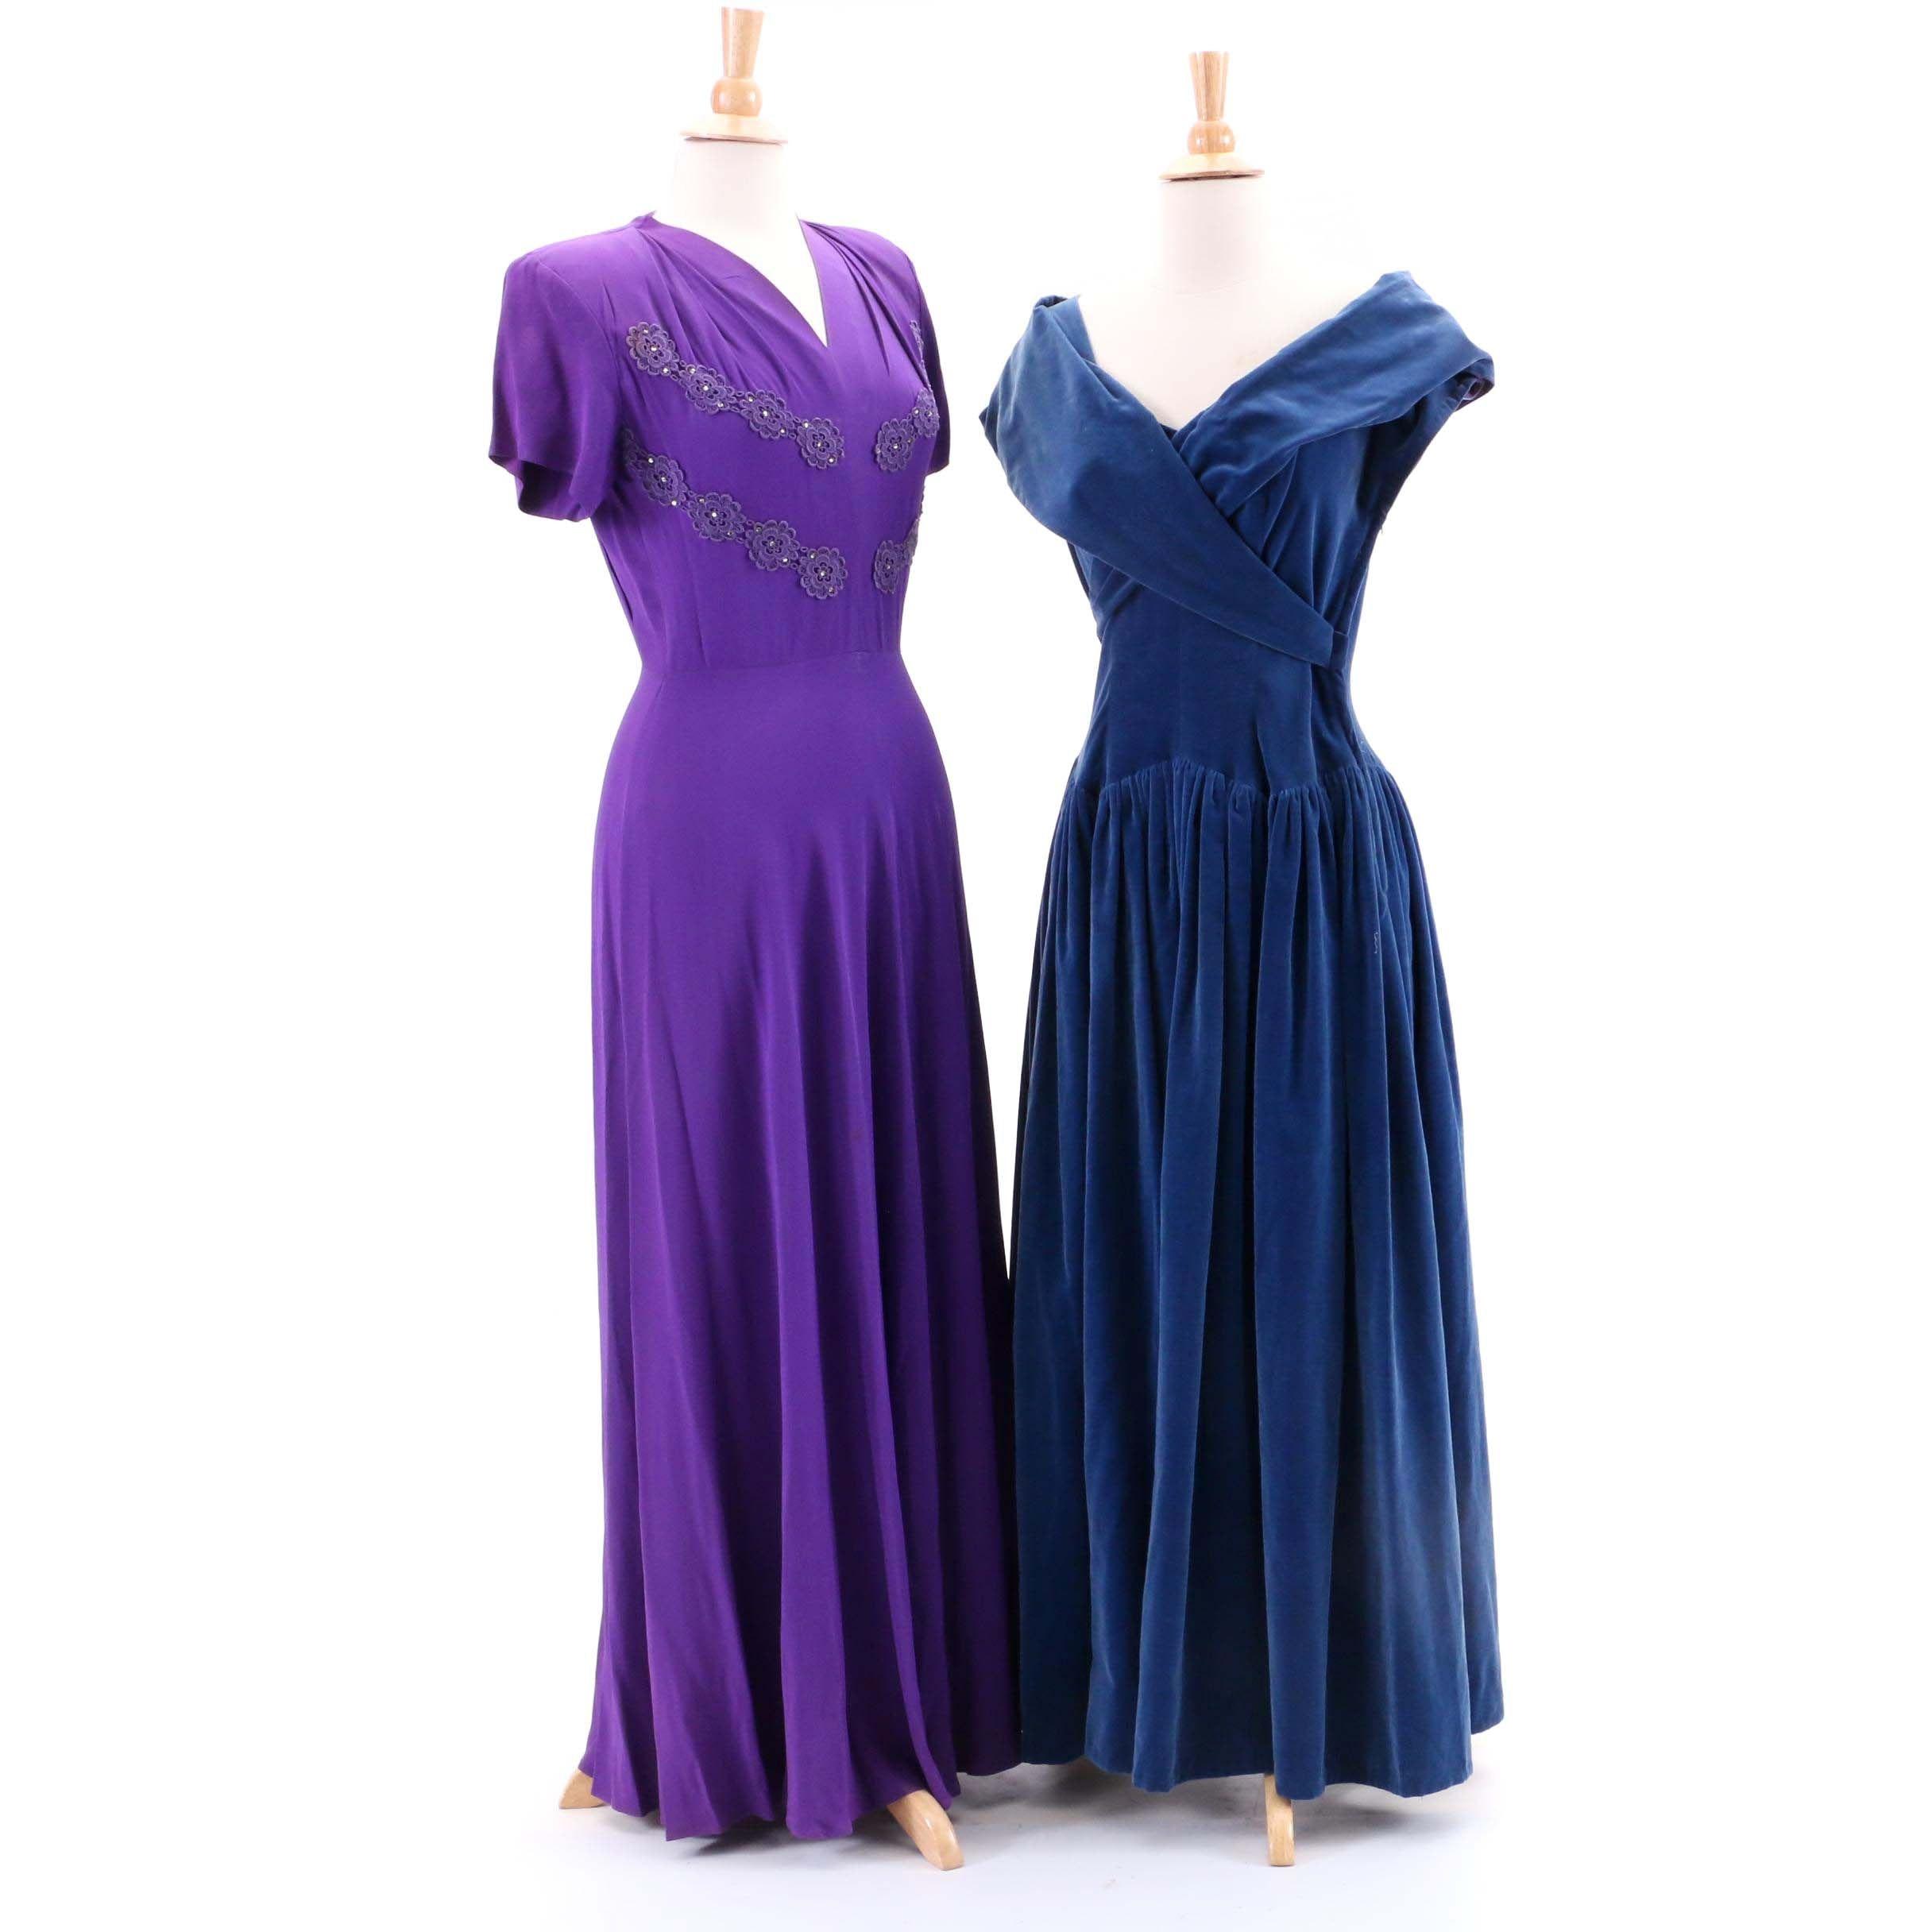 Circa 1940s Vintage Evening Dresses